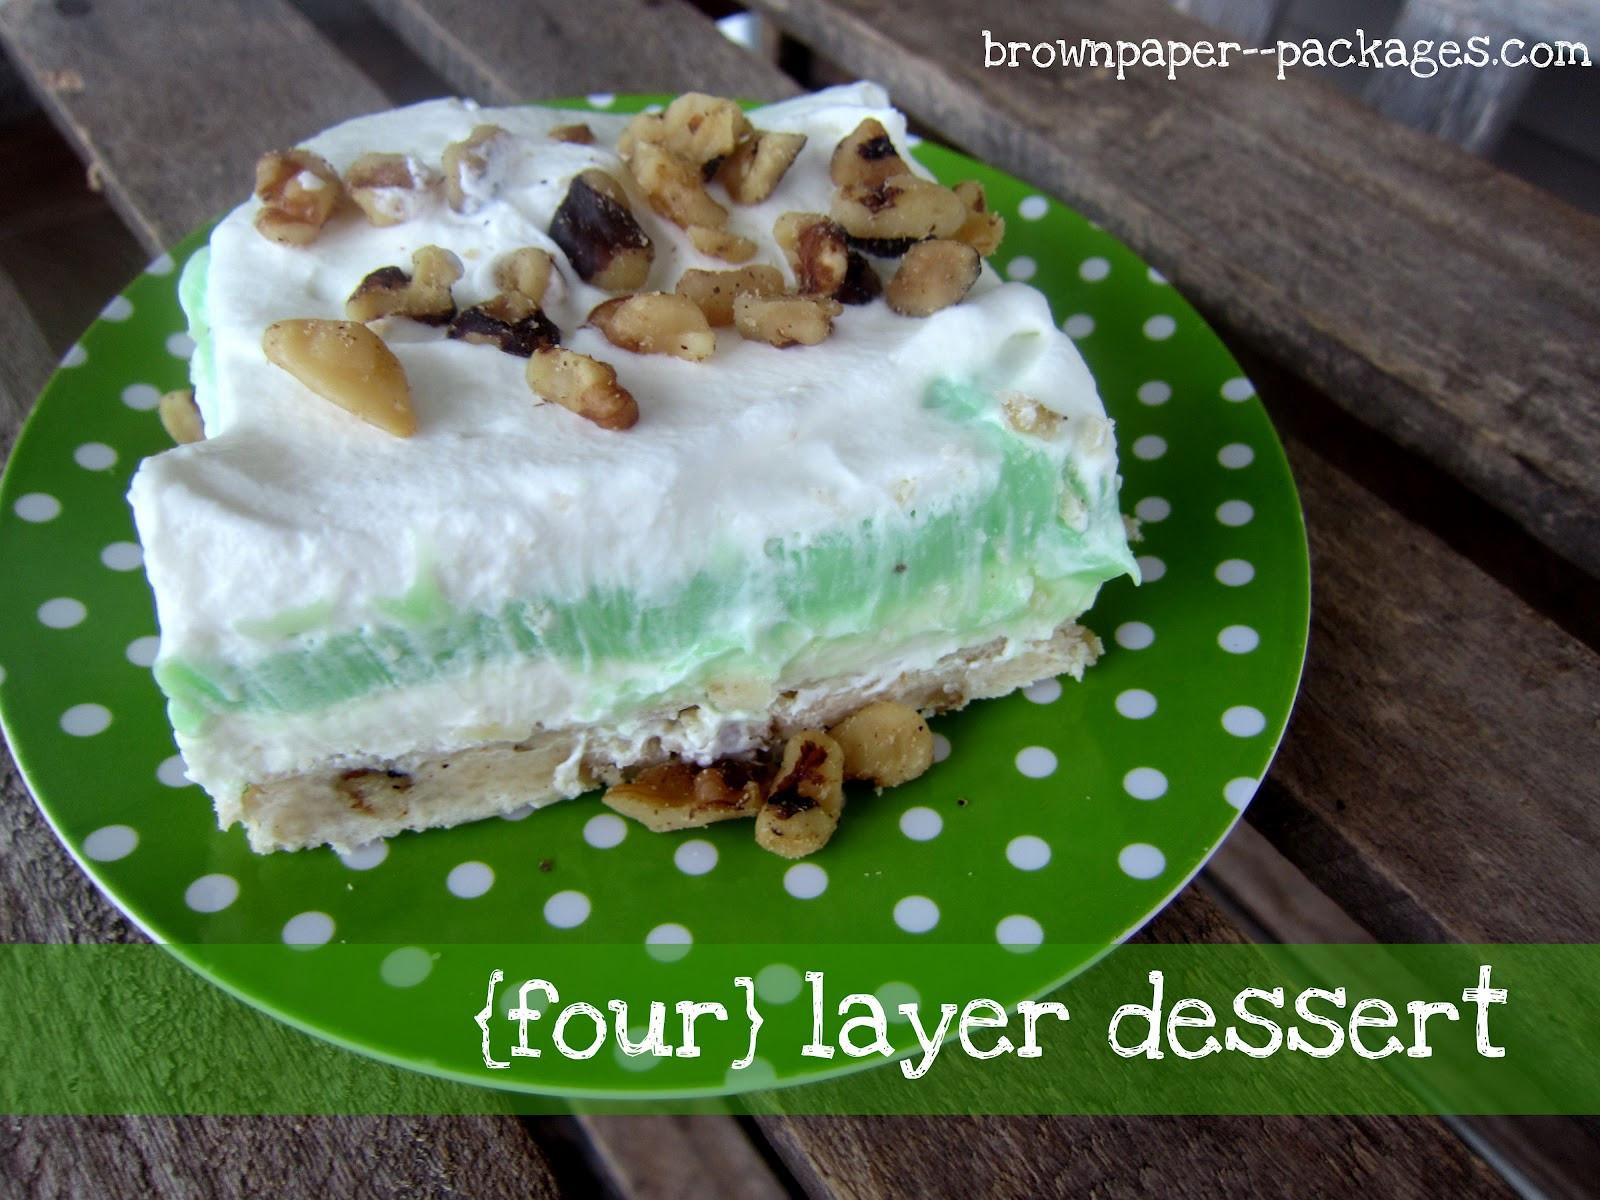 Pistachio Pudding Dessert  four layer dessert Simply Kierste Design Co